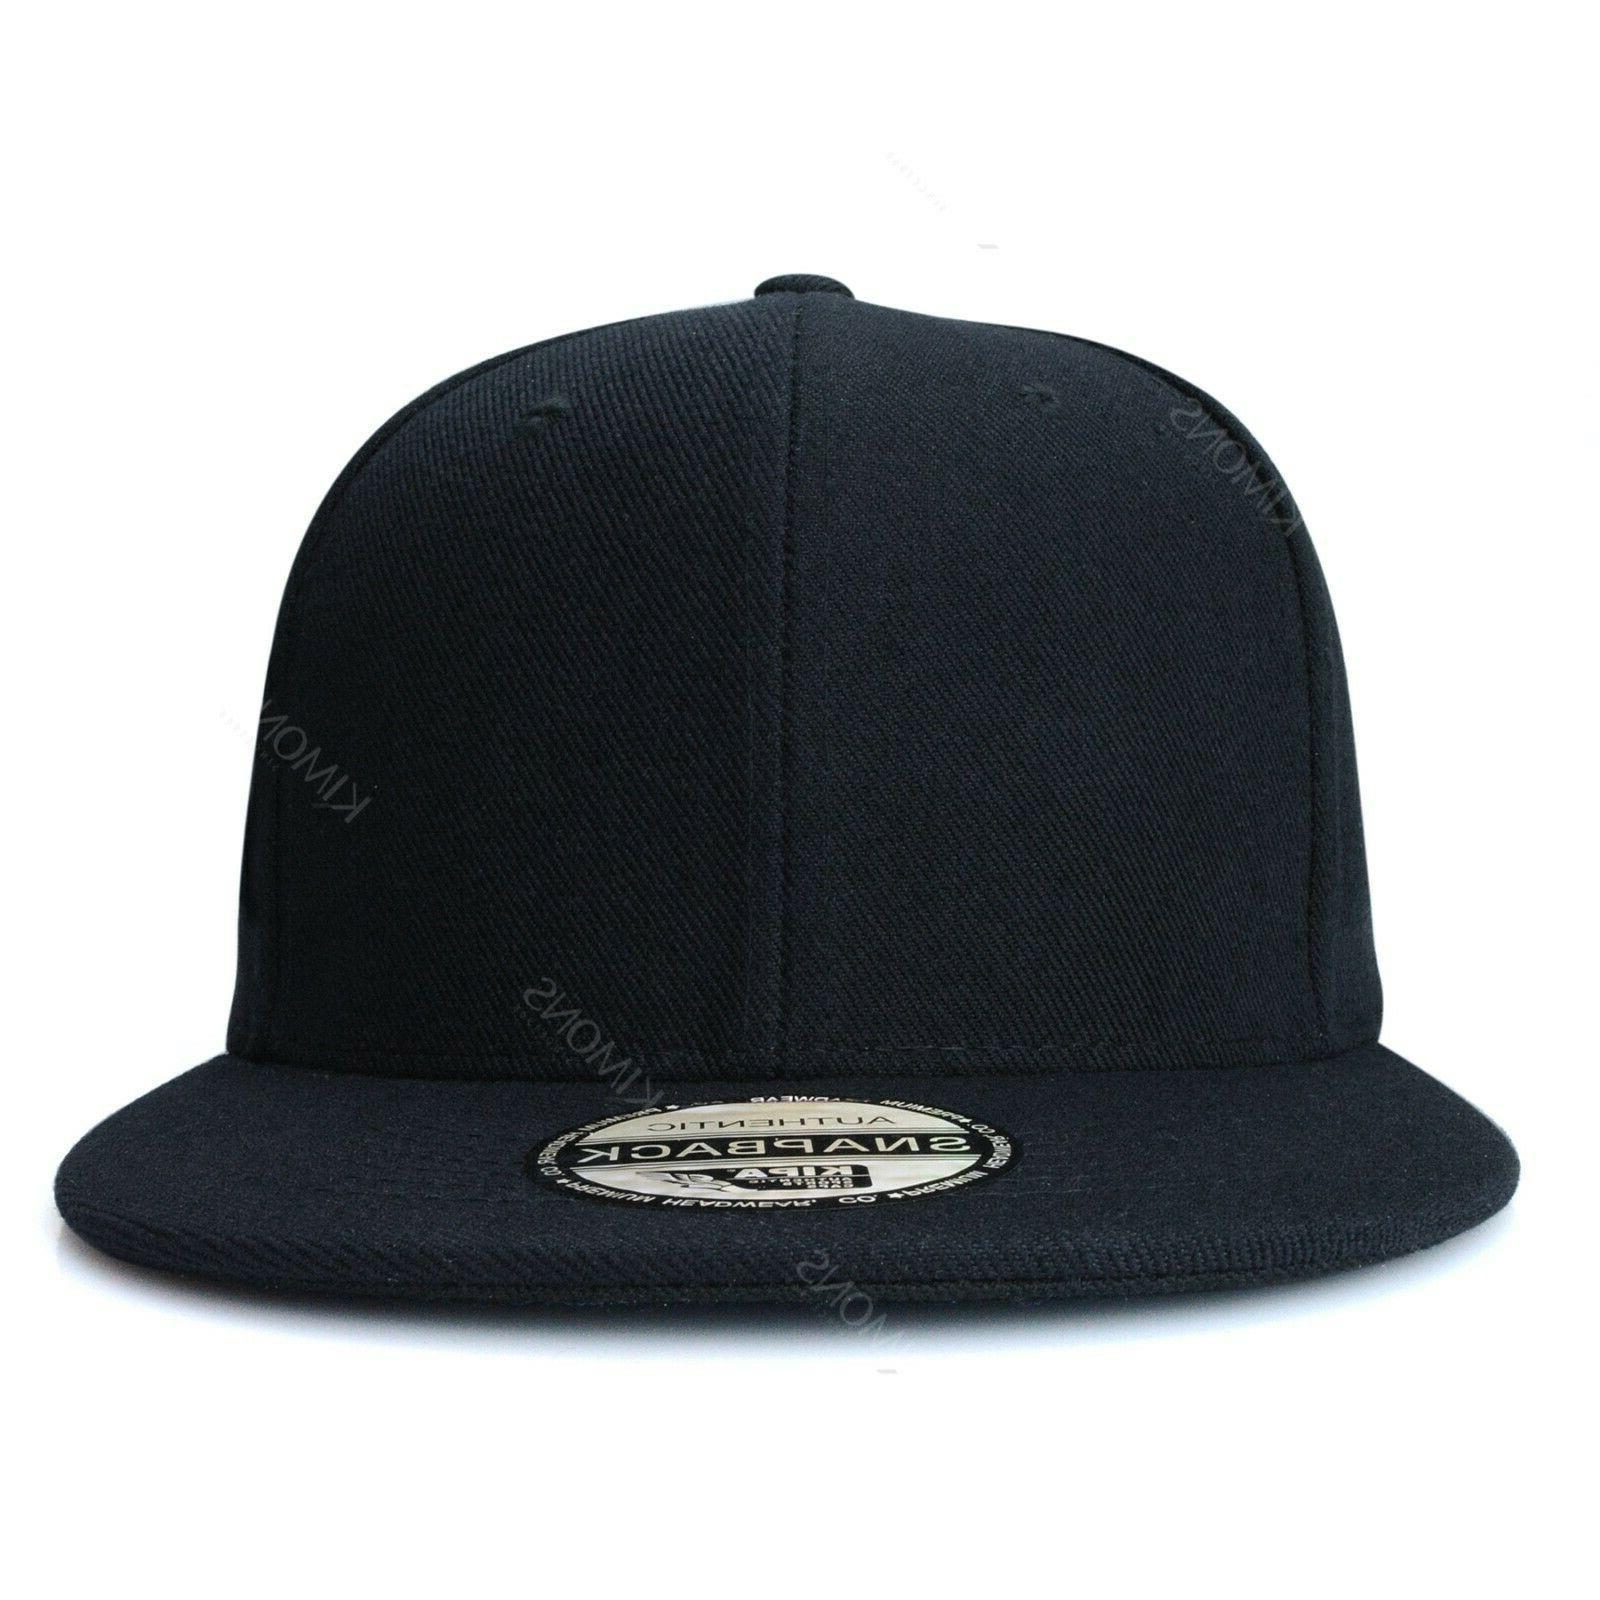 Snapback Hat Cap Solid Plain Blank Men Adjustable